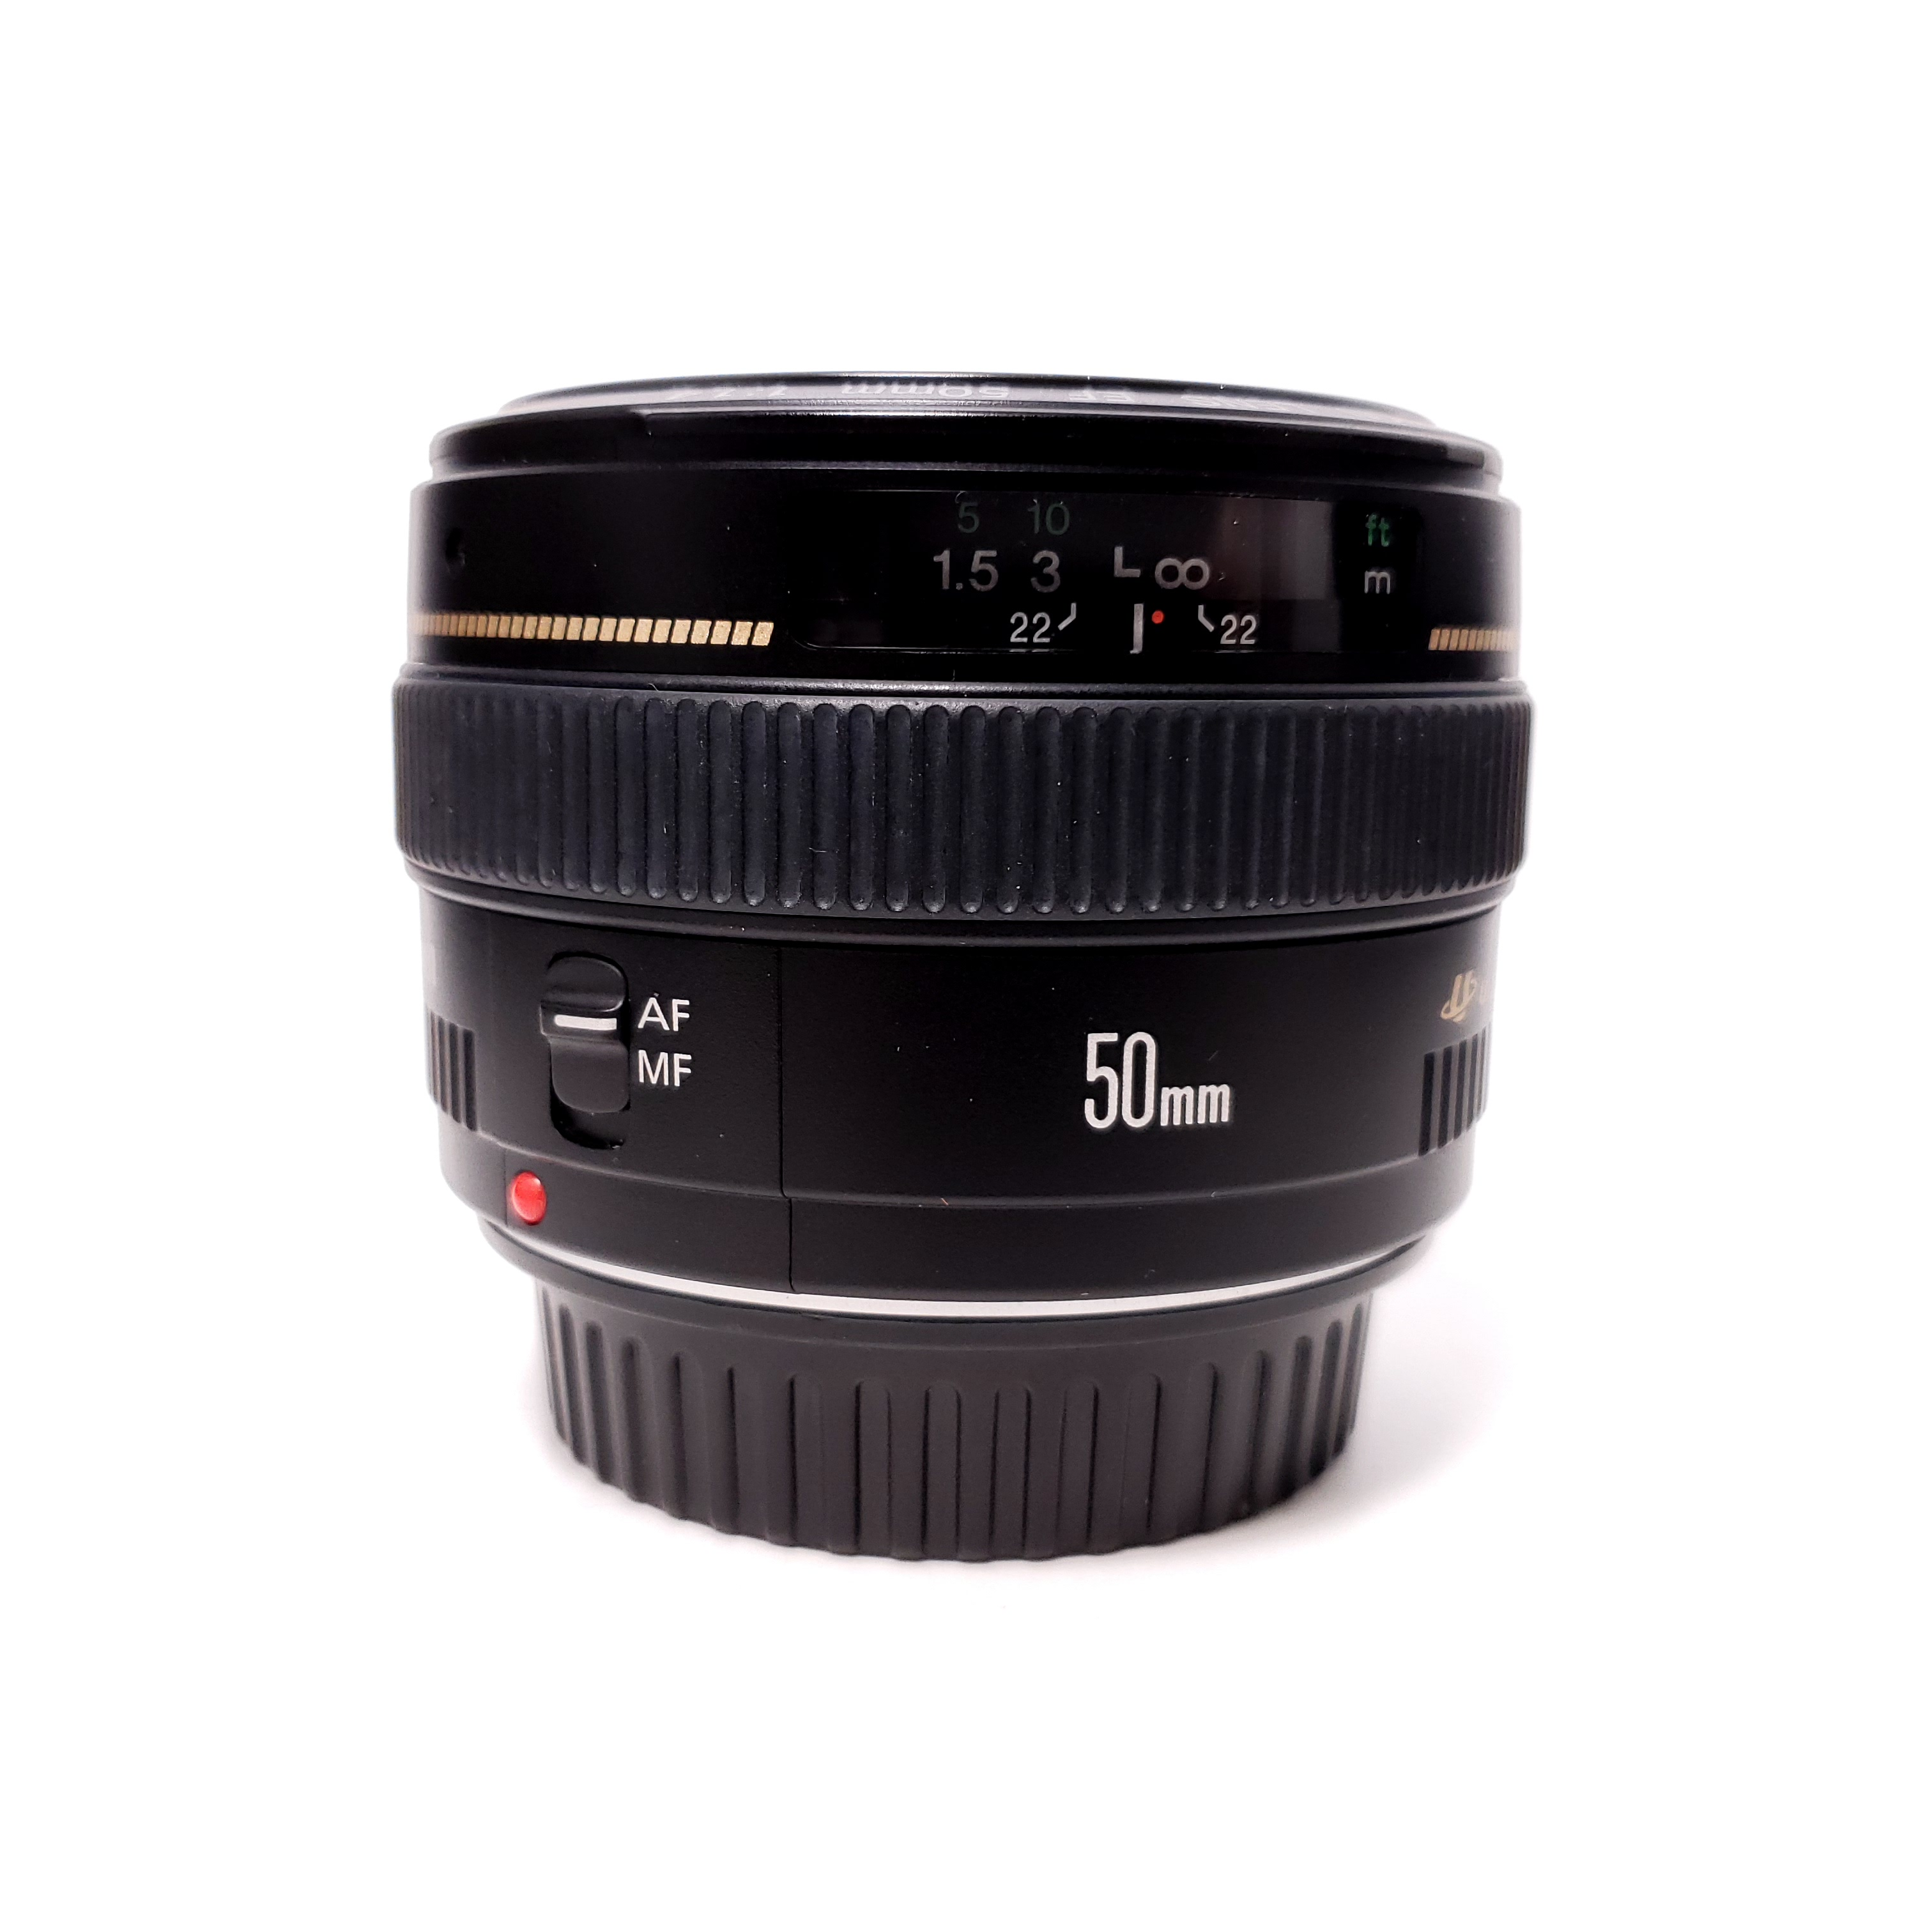 USED Canon 50mm F1.4 EF USM Lens